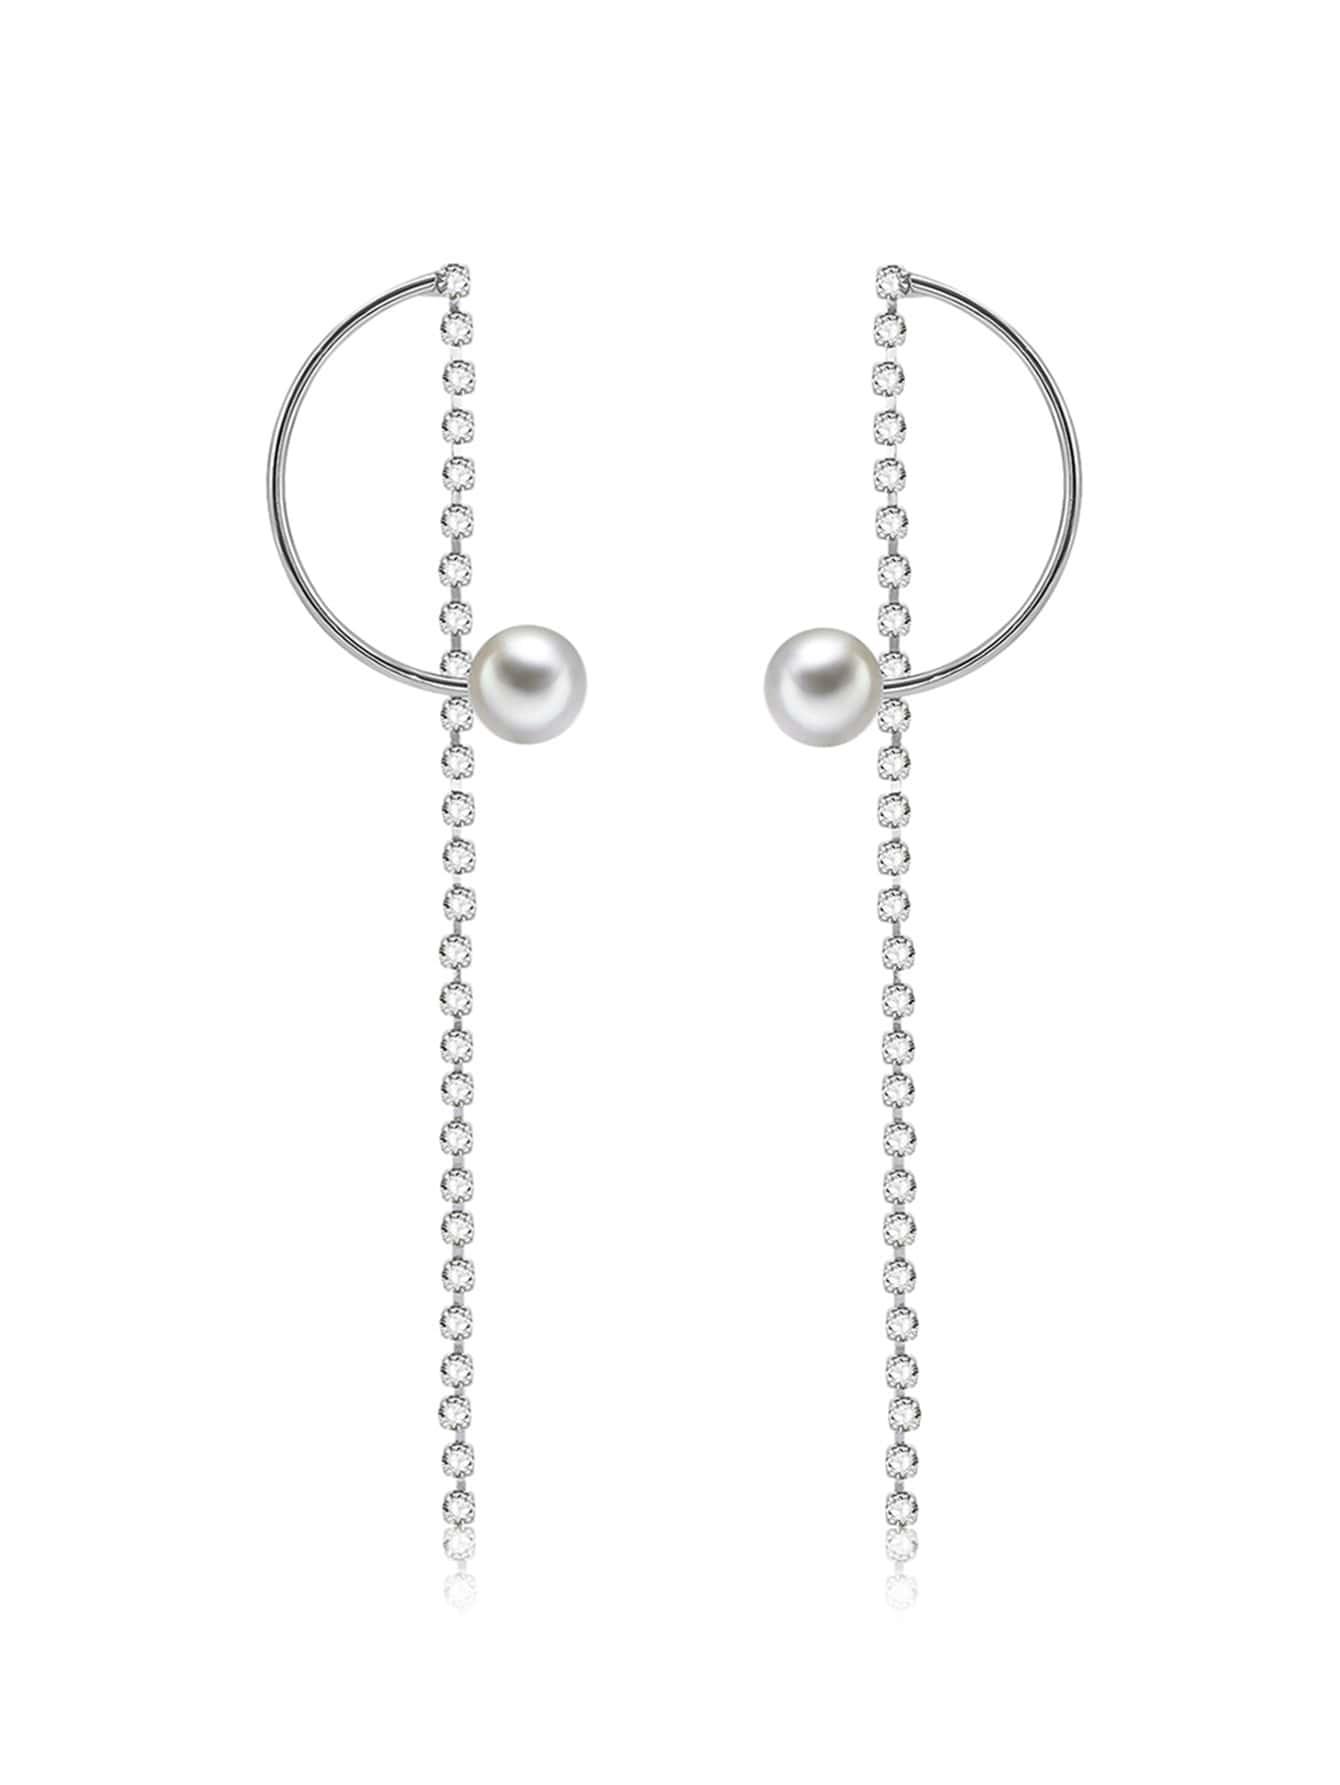 Half Circle Design Drop Earrings